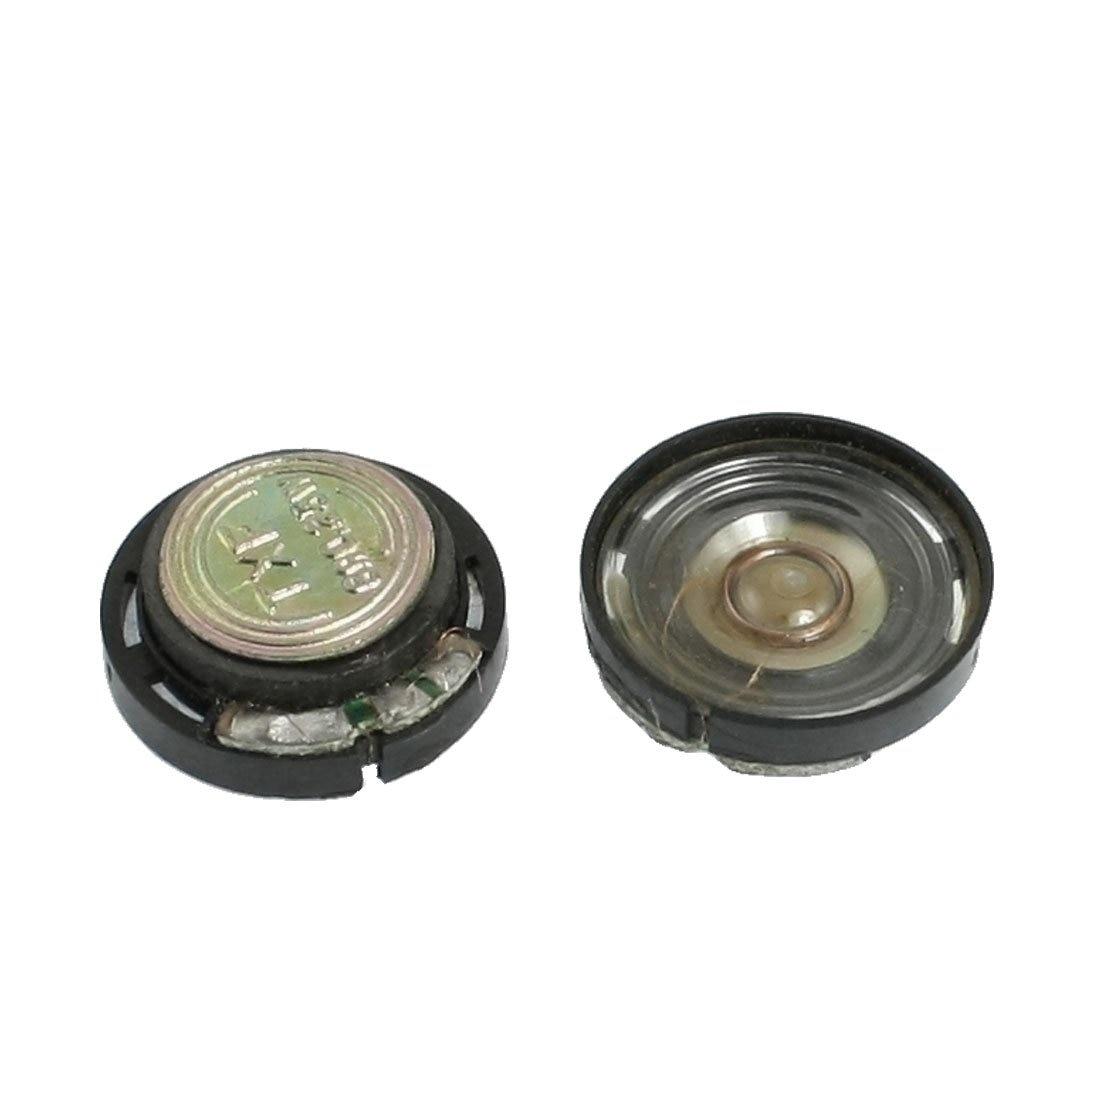 2X Small Mini Speaker 20Mm Magnetic Type Round Plastic Shell Speaker 8 Ohm 0.25W 2 Pcs